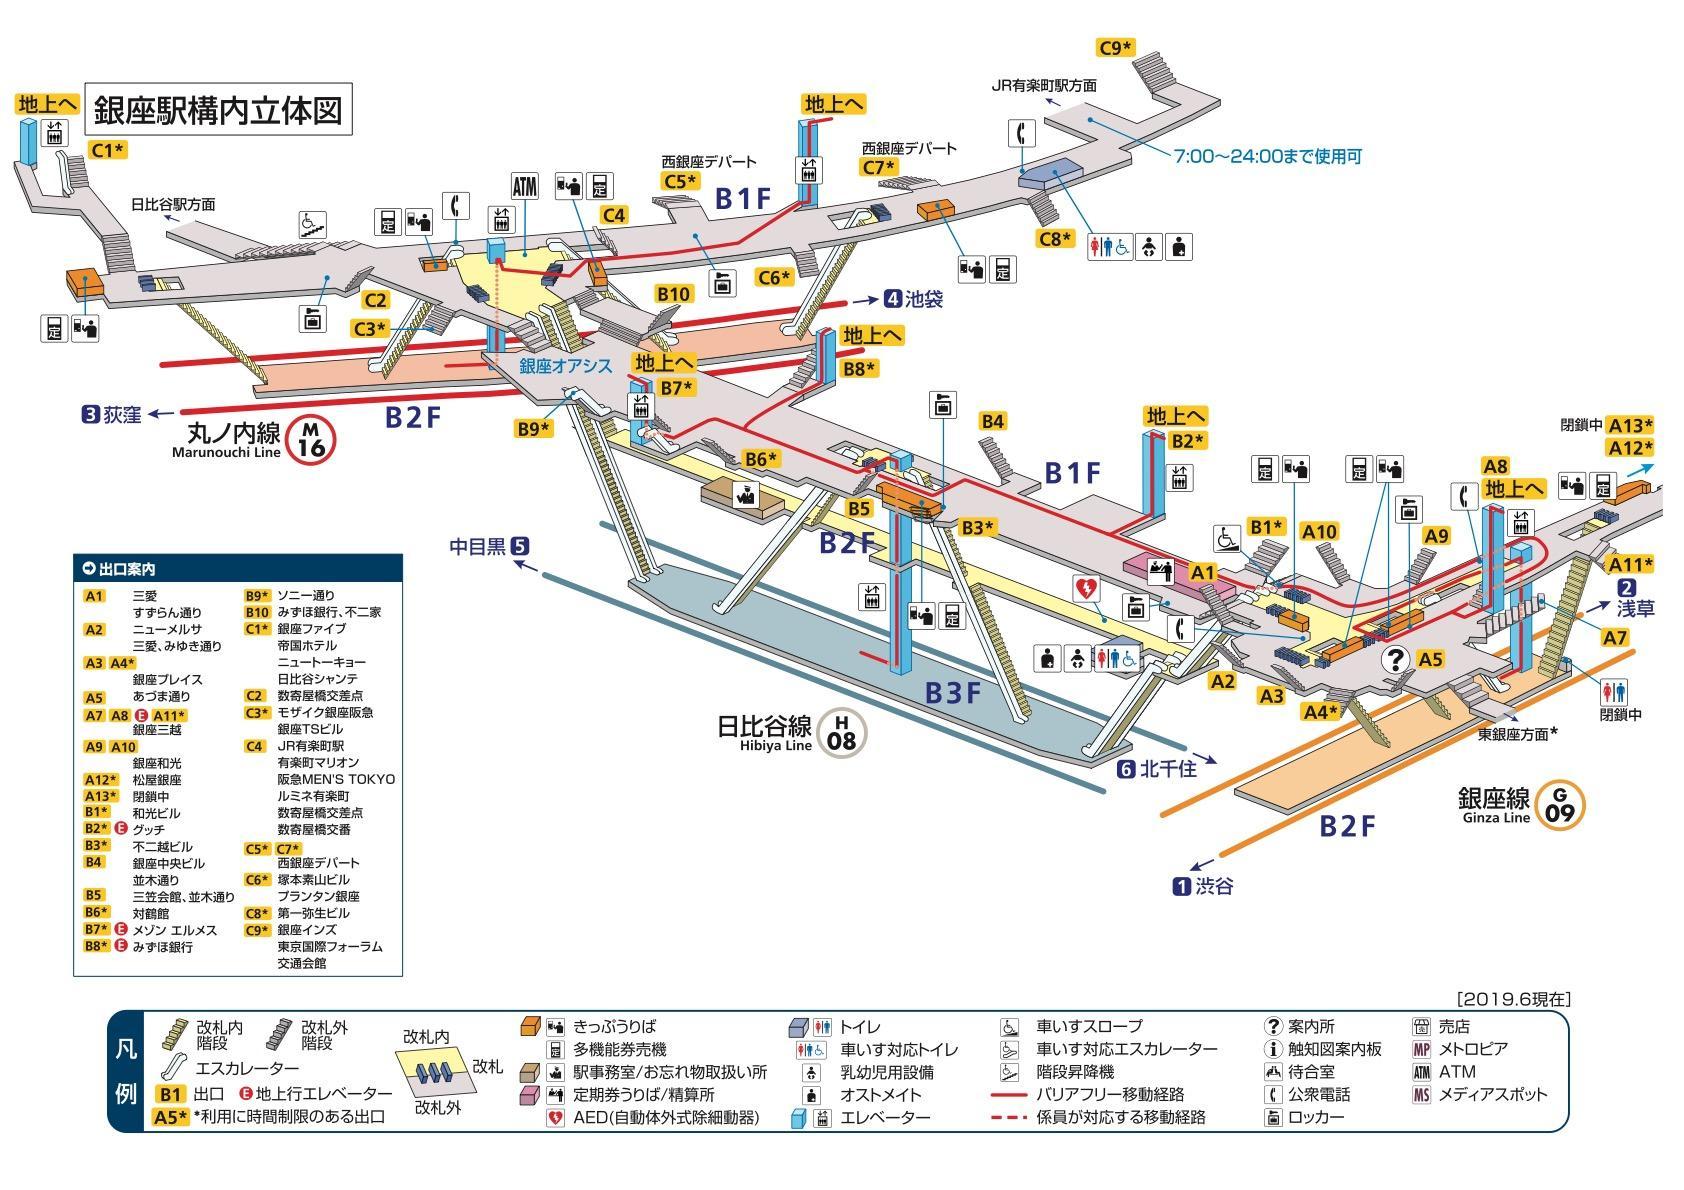 A7出入口 | 銀座駅/G09/M16/H08 | 東京メトロ